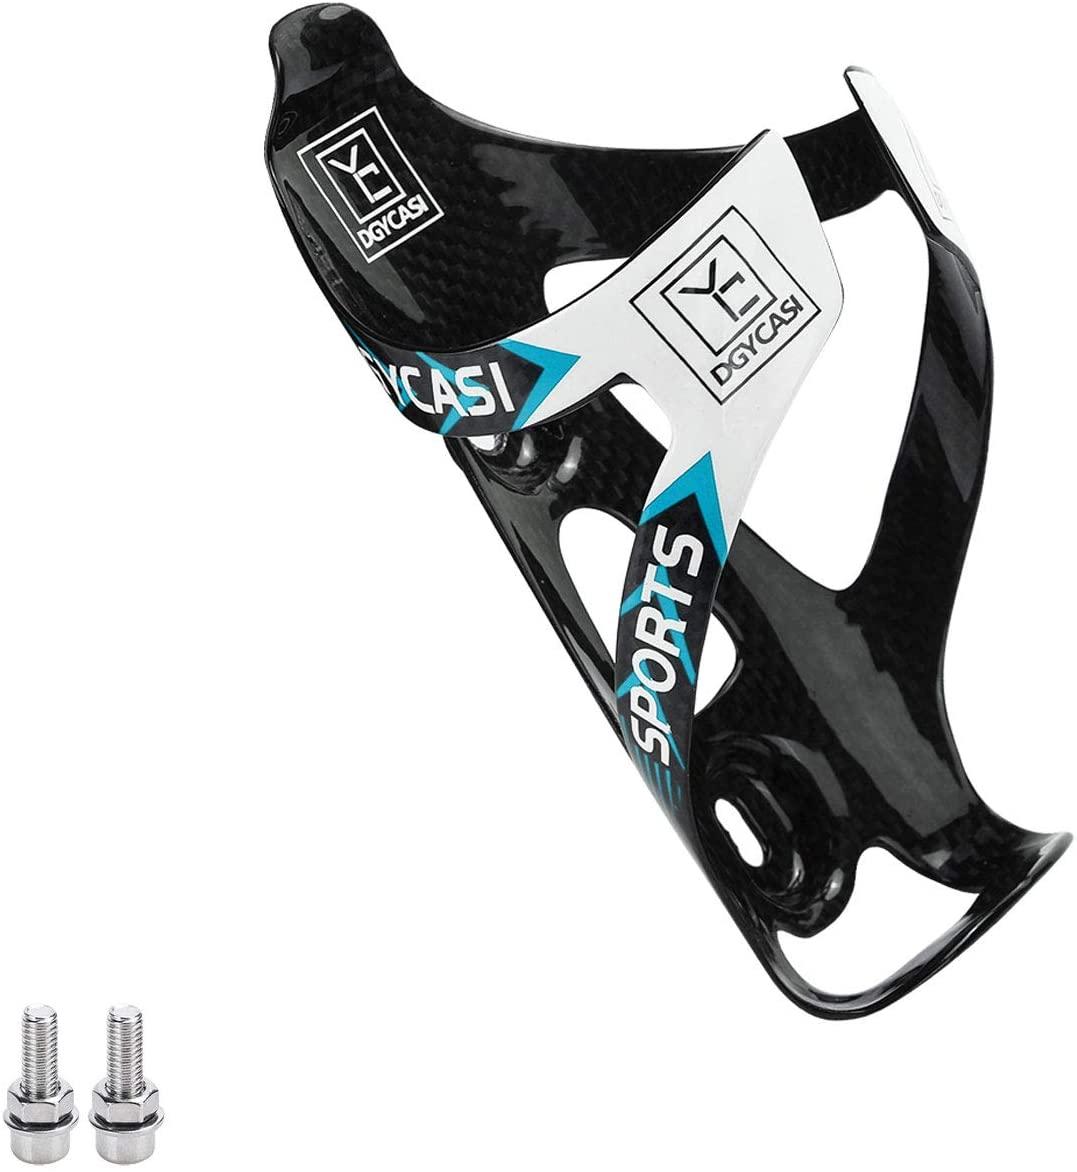 Ultra Light Full Carbon Fiber Bicycle Bike Light Drink Water Bottle Cage Holder for Triathlon & MTB Fits Most Cycling Bottles